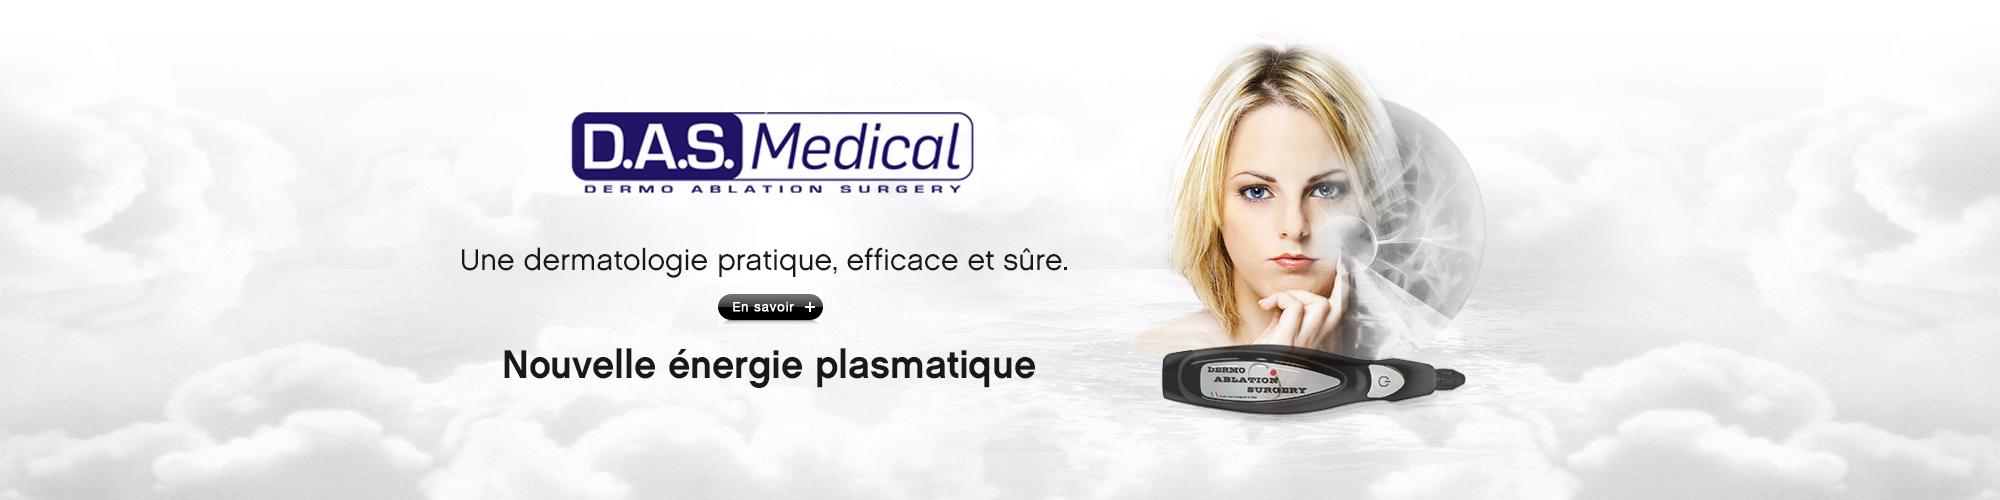 https://www.capactuel.com/storage/app/media/Carousel/accueil/DASMEDICAL.jpg